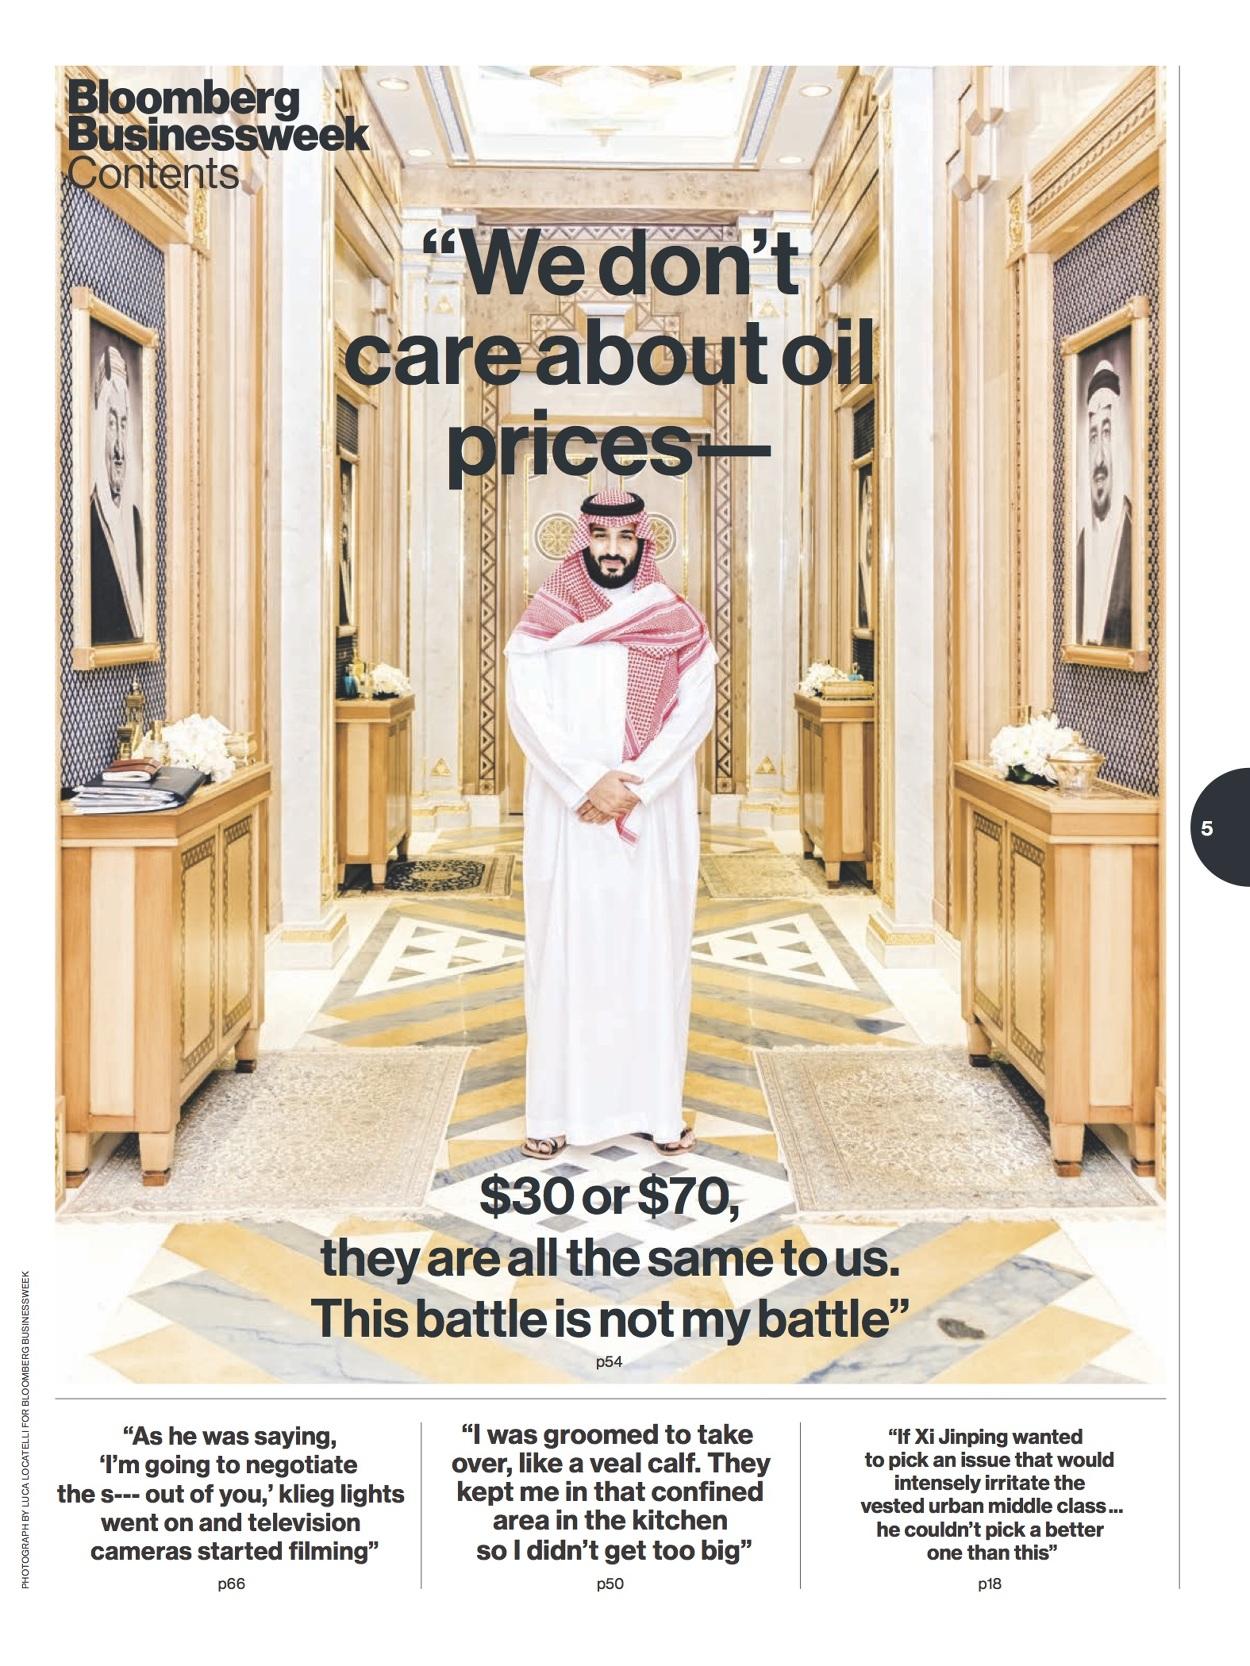 tearsheet: Luca Locatelli photographs Prince Mohammed bin